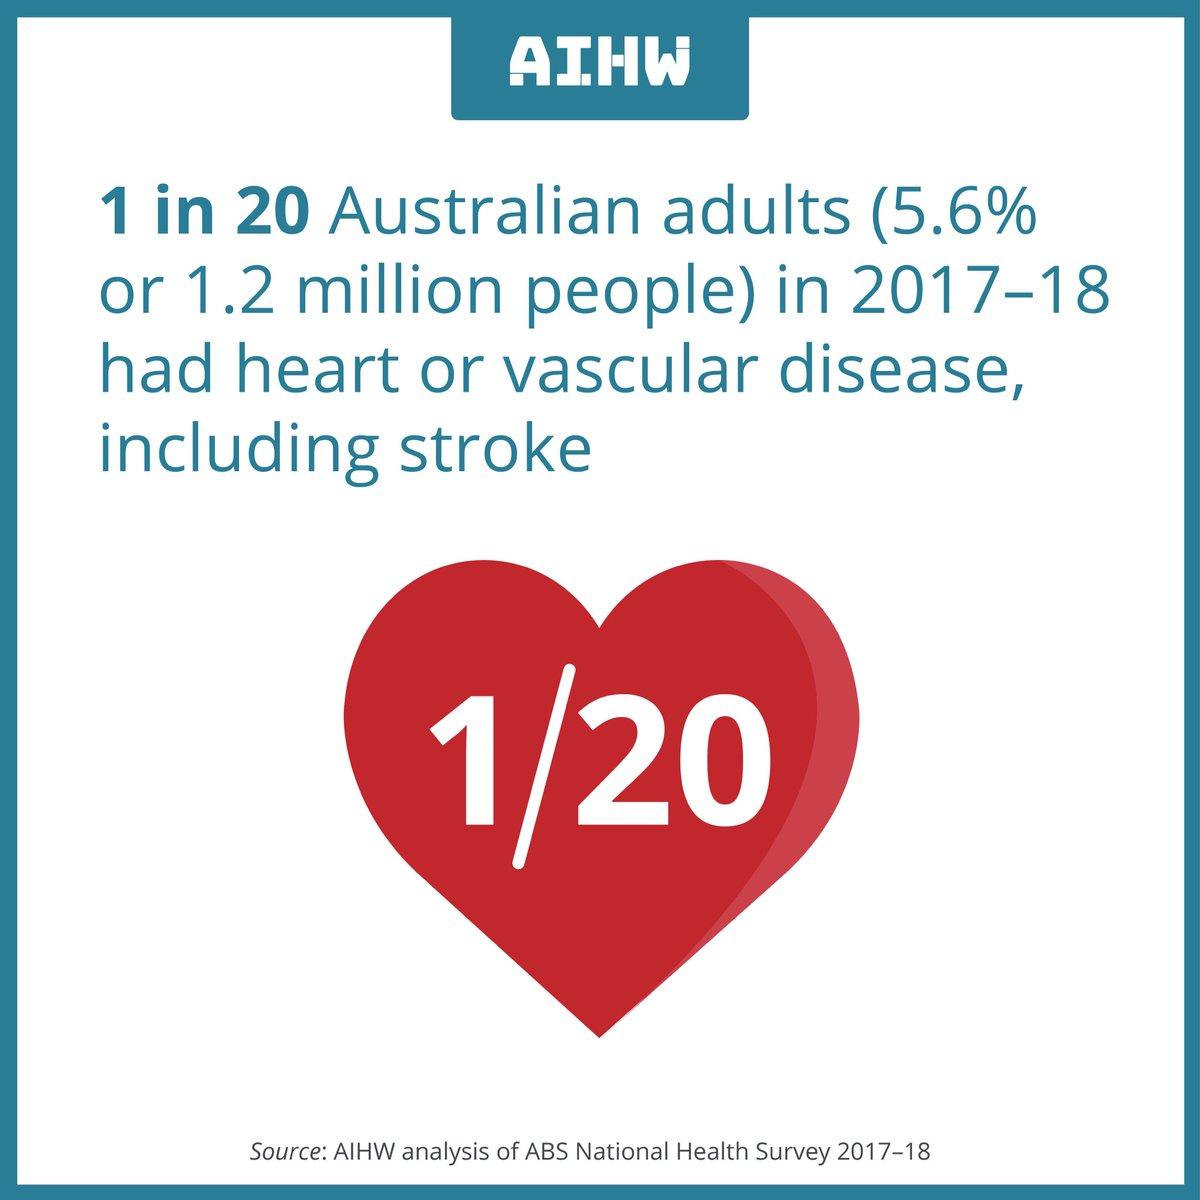 #Bloodpressure (#BP) control is the most important modifiable risk factor for stroke @AnastasiaSMihai @HBPRCA @FZMarques @CHFofAustralia @heartfoundation @alta_schutte @TheRACP @NPSMedicineWise @AustPrescriber https://t.co/lx6U4BPuly